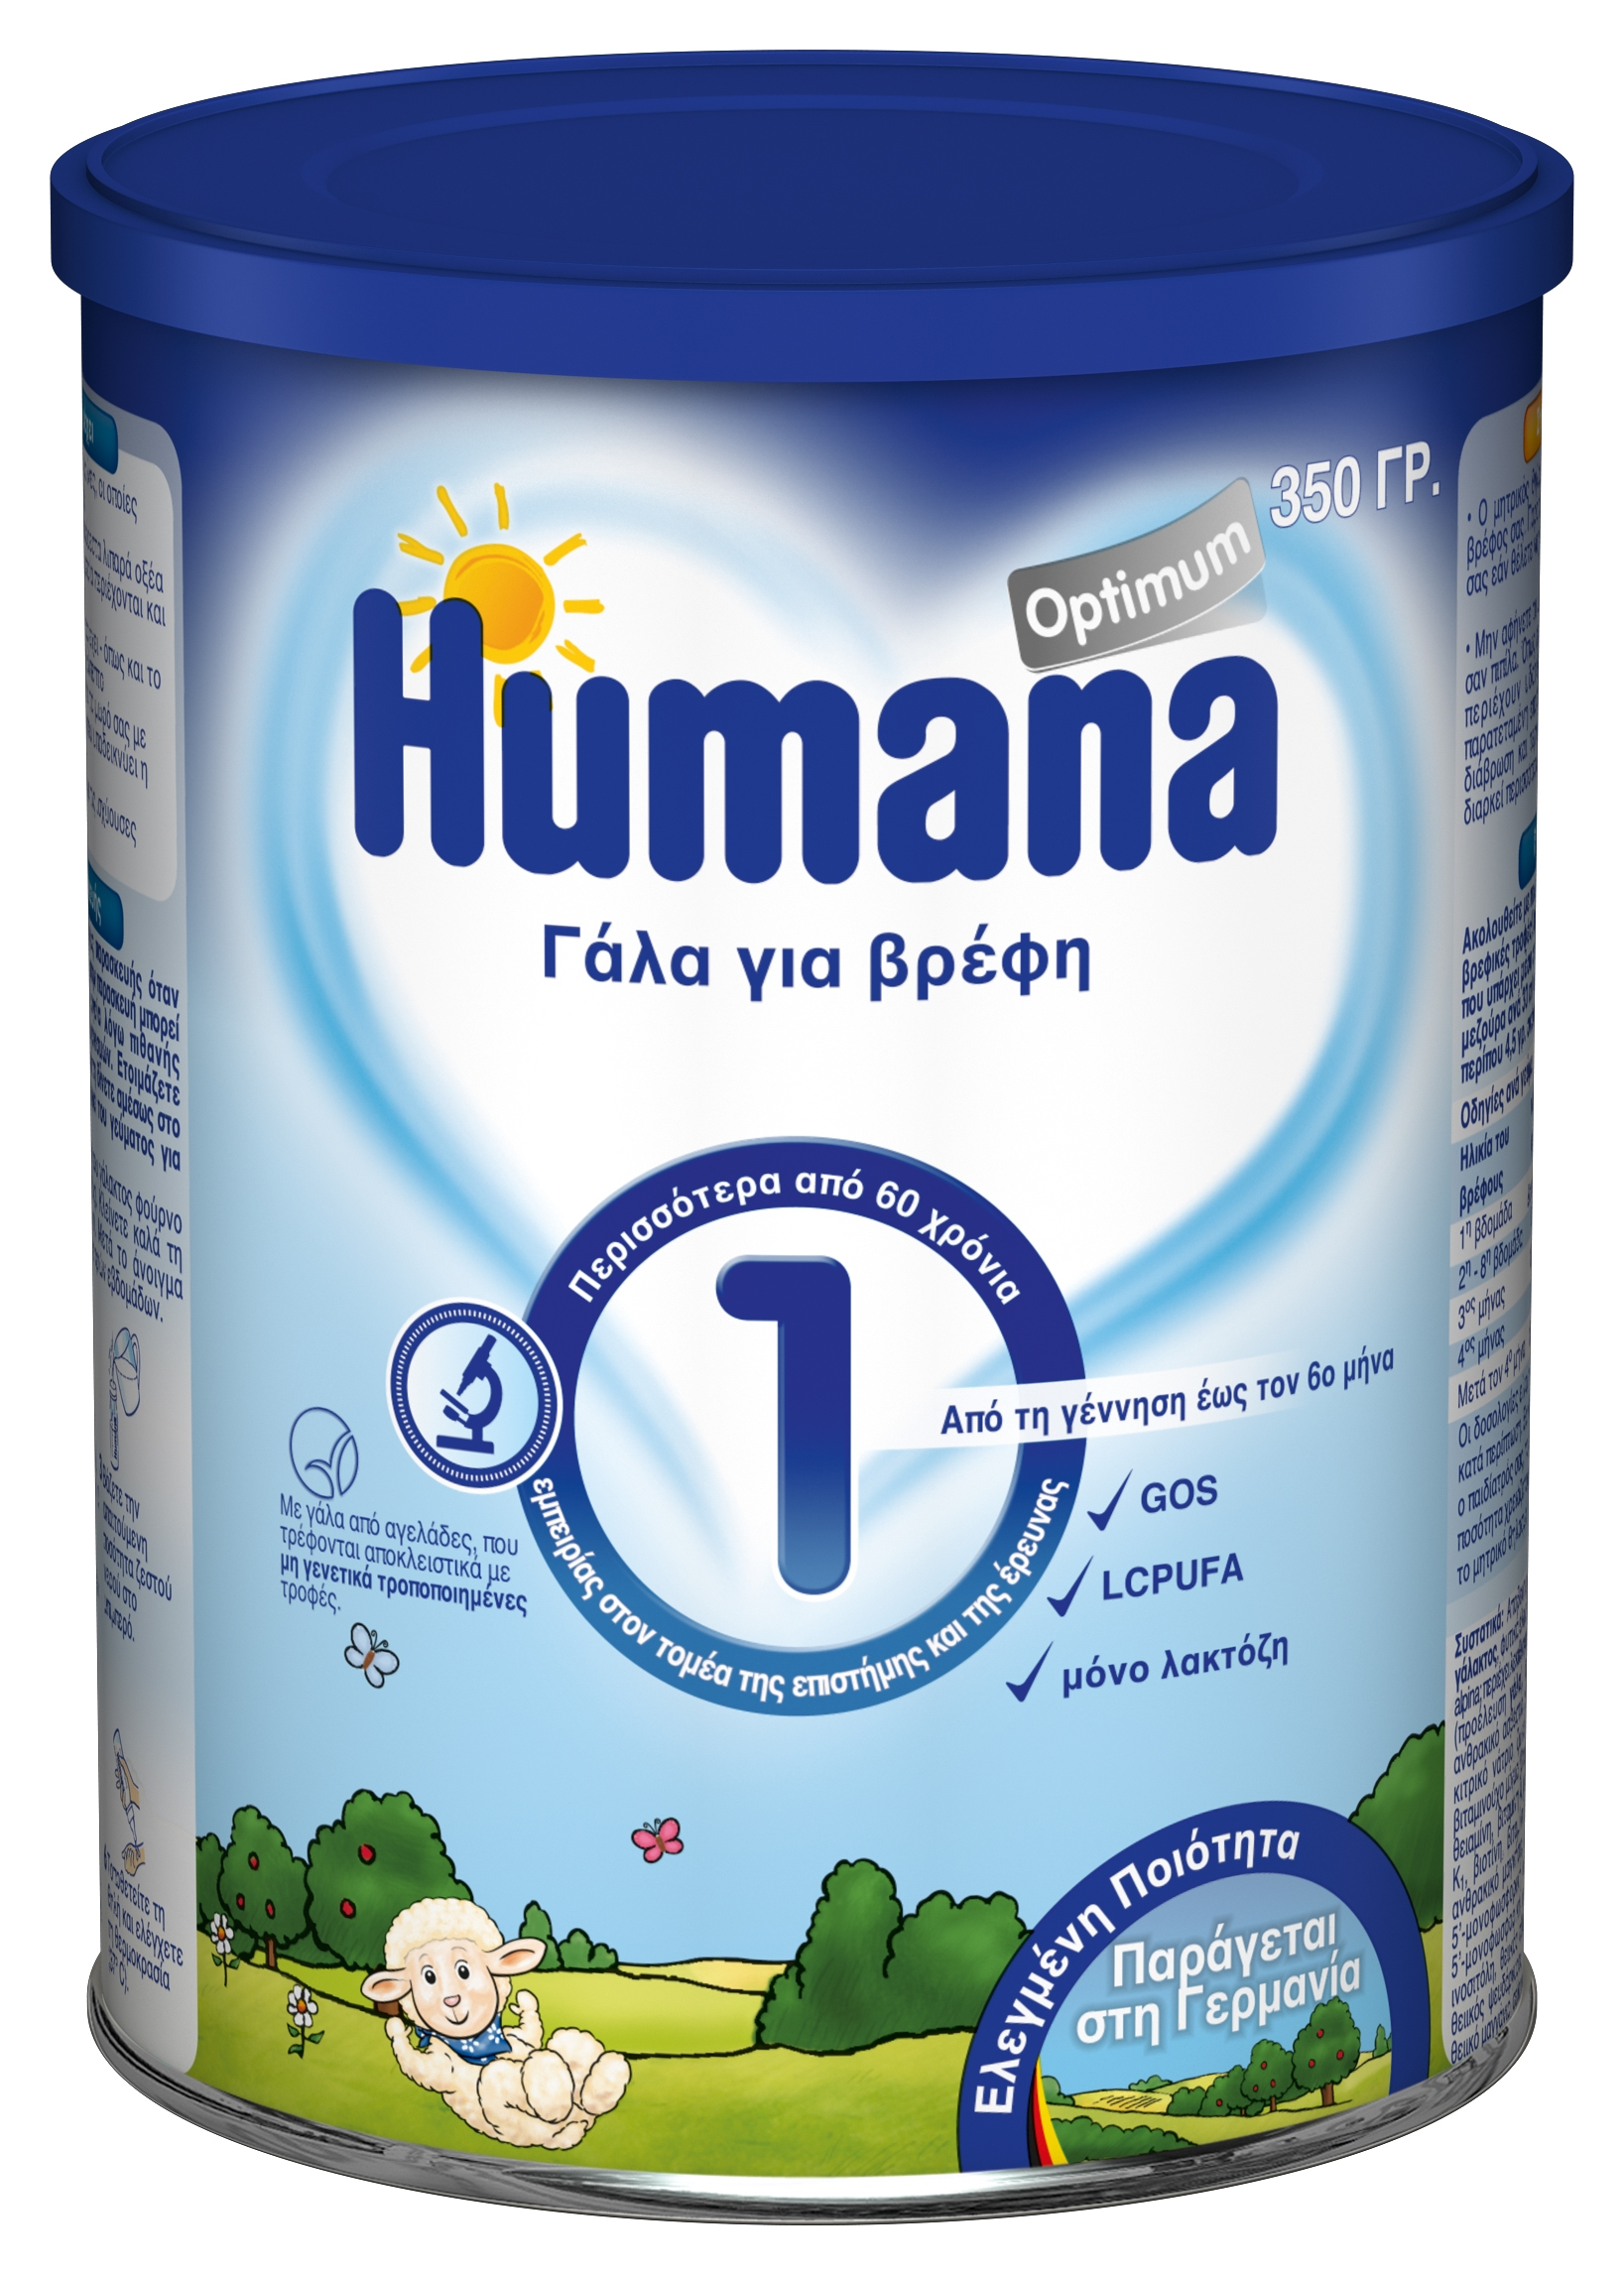 0a5a9c7fdf9 Humana Optimum 1 Βρεφικό Γάλα, απο τη Γέννηση εως τον 6ο μήνα, 350gr ...